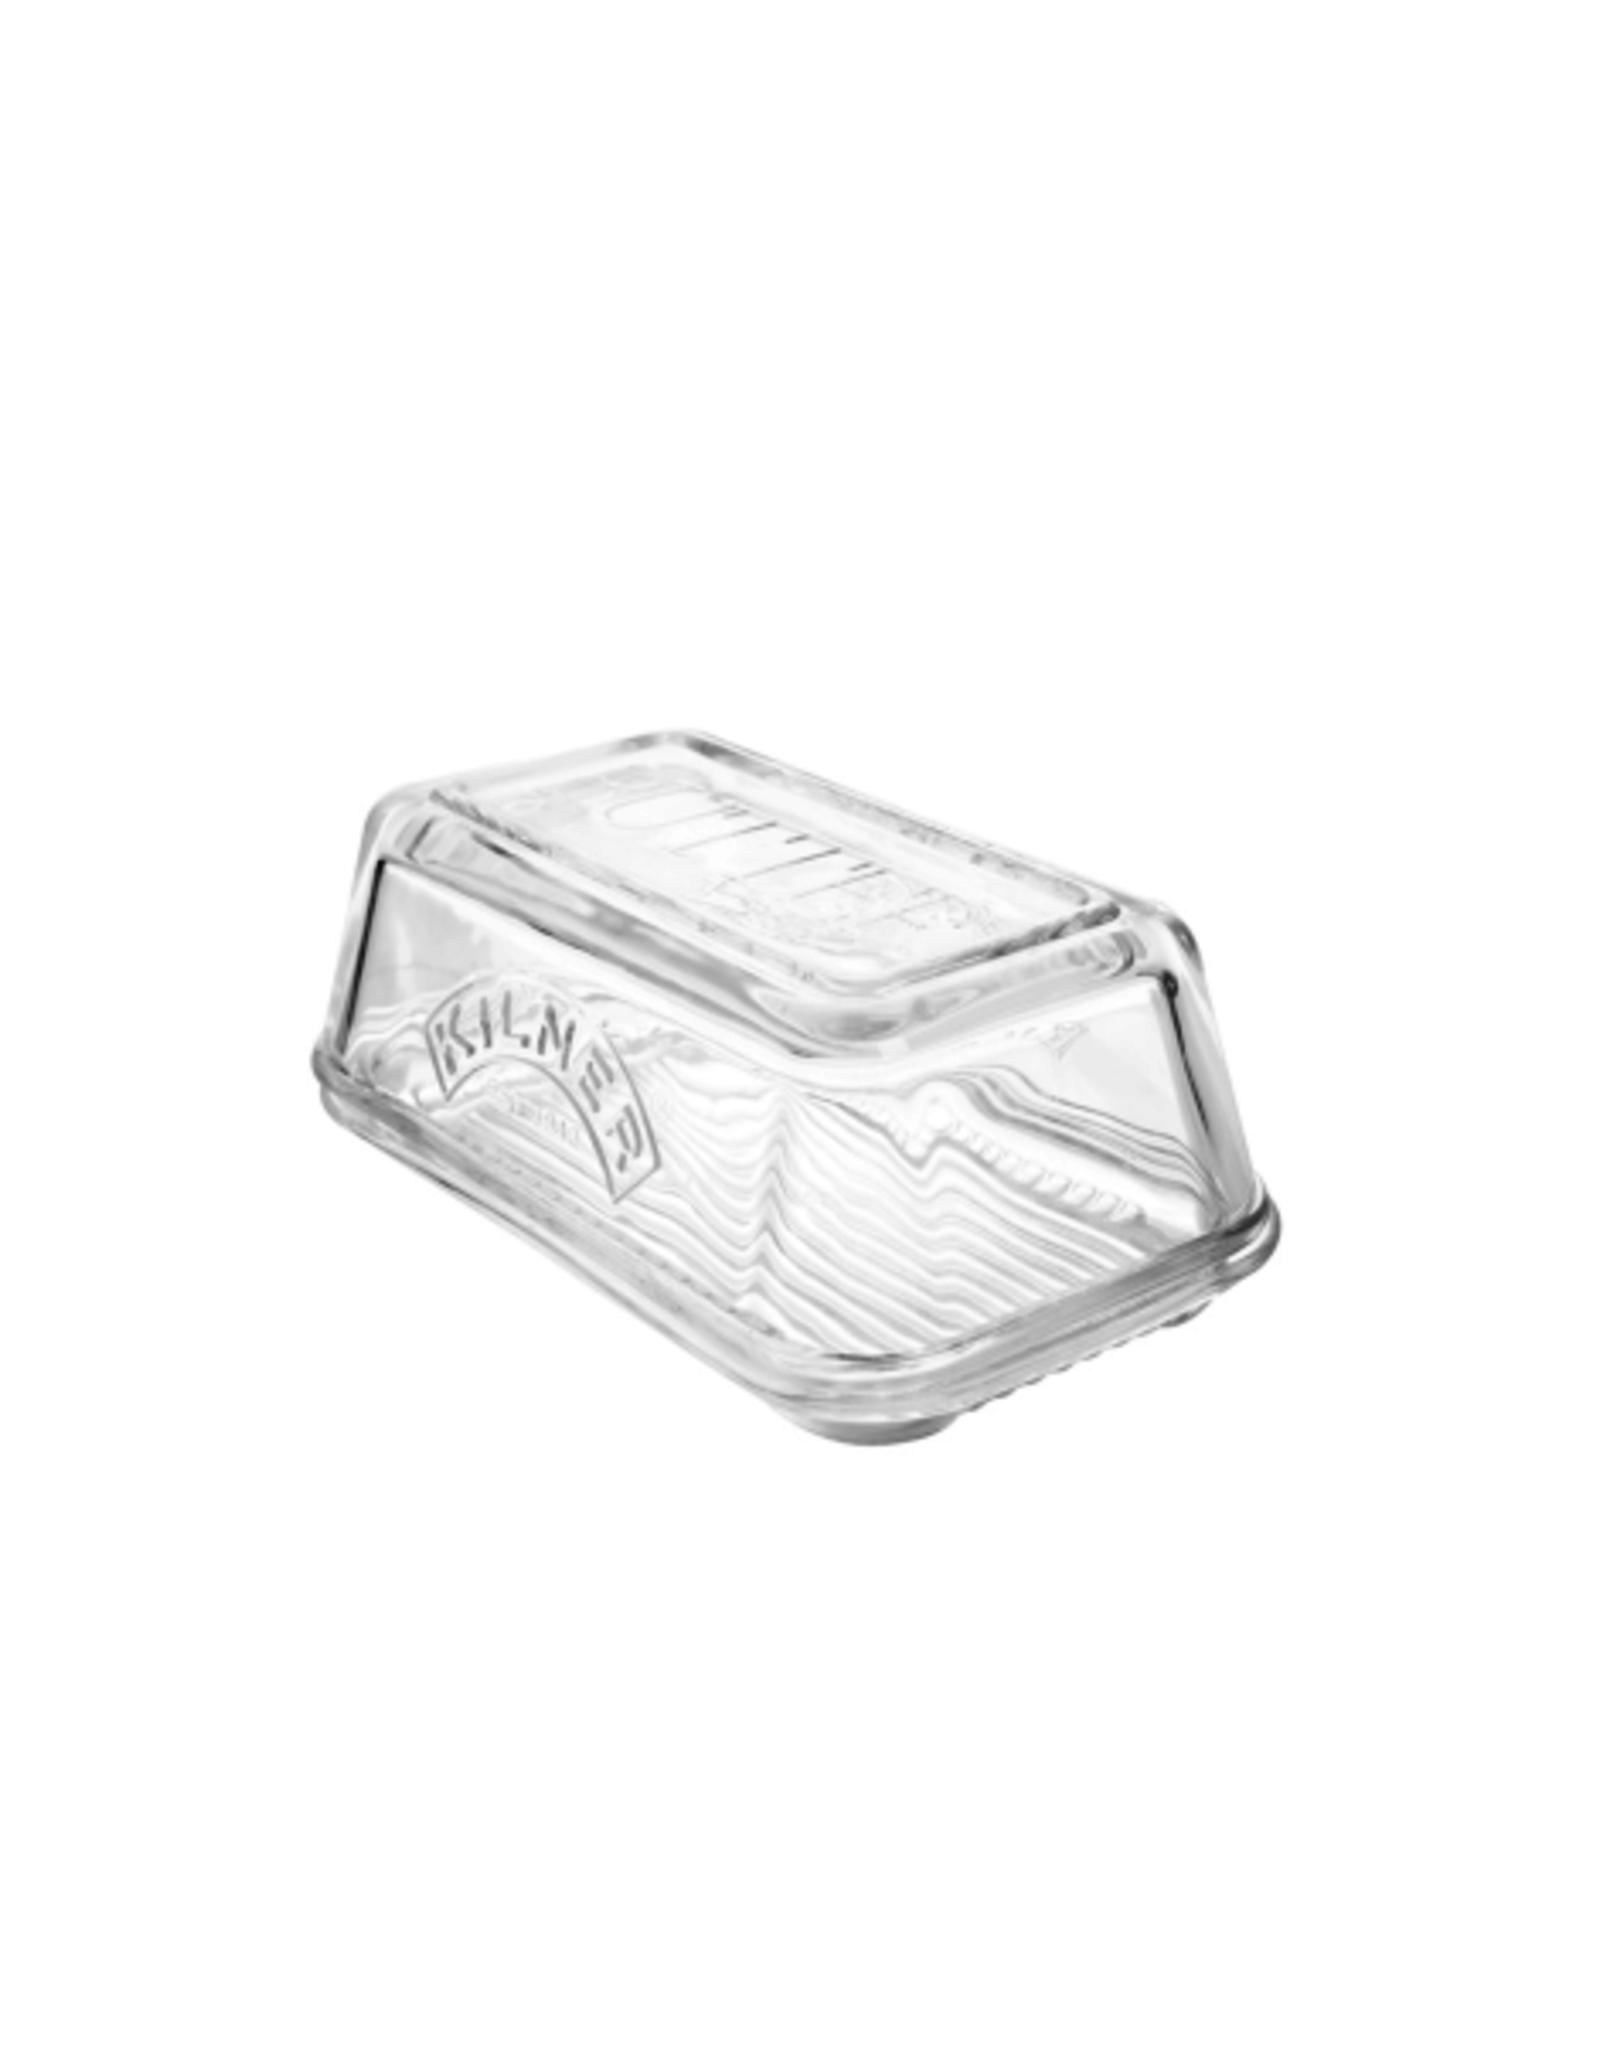 PLE - Butter Dish 1lb